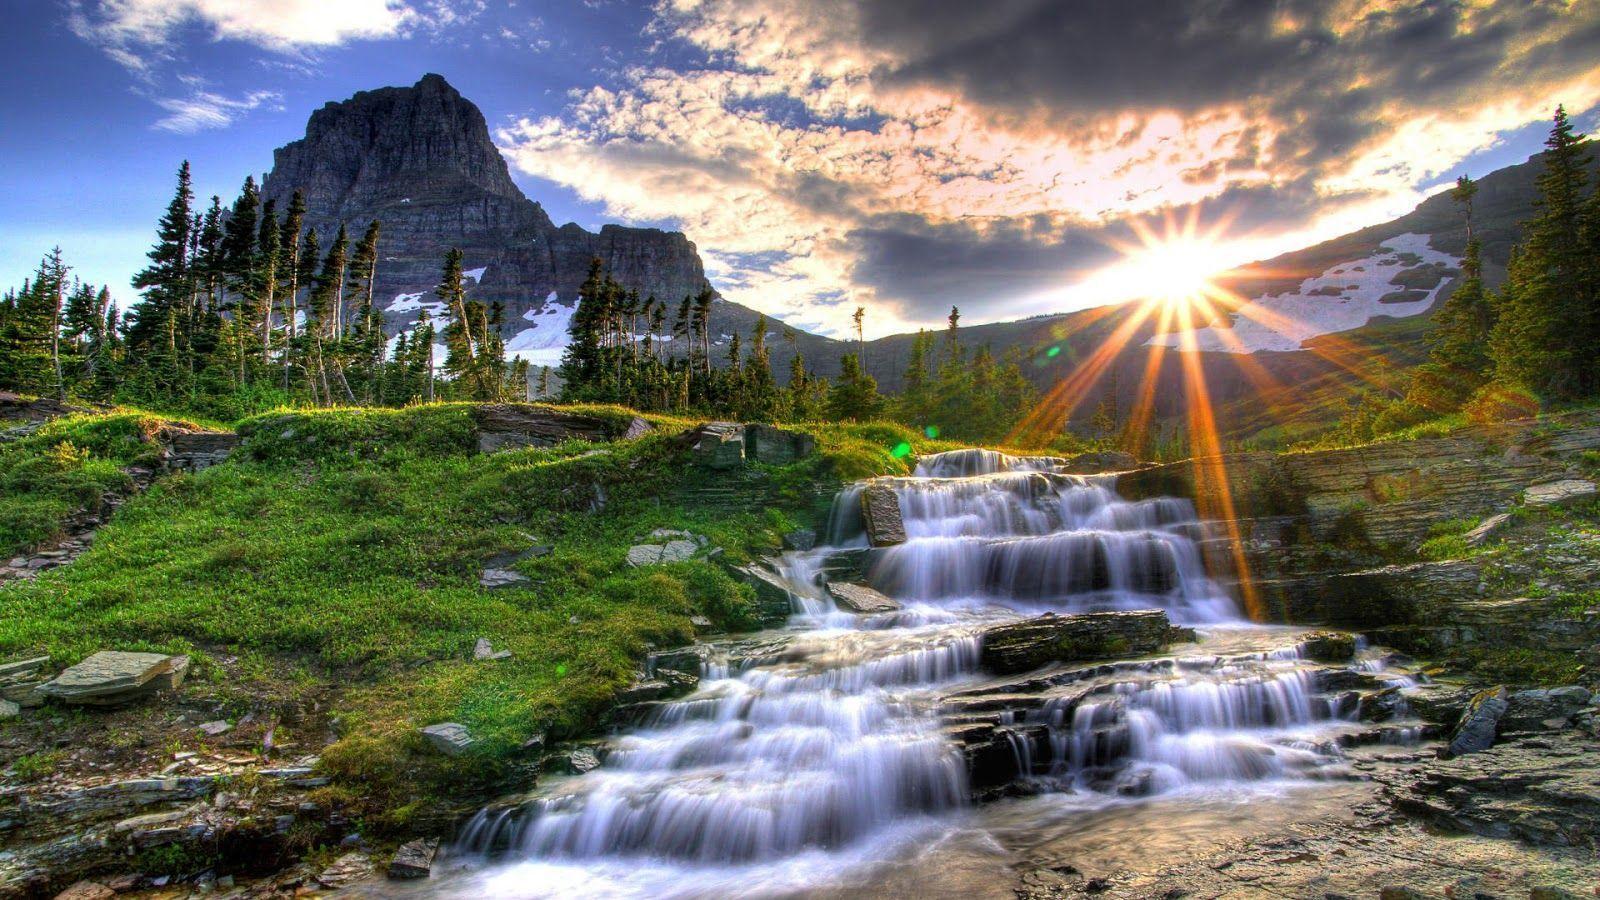 hd wallpaper nature 1080p19 Waterfall, Beautiful